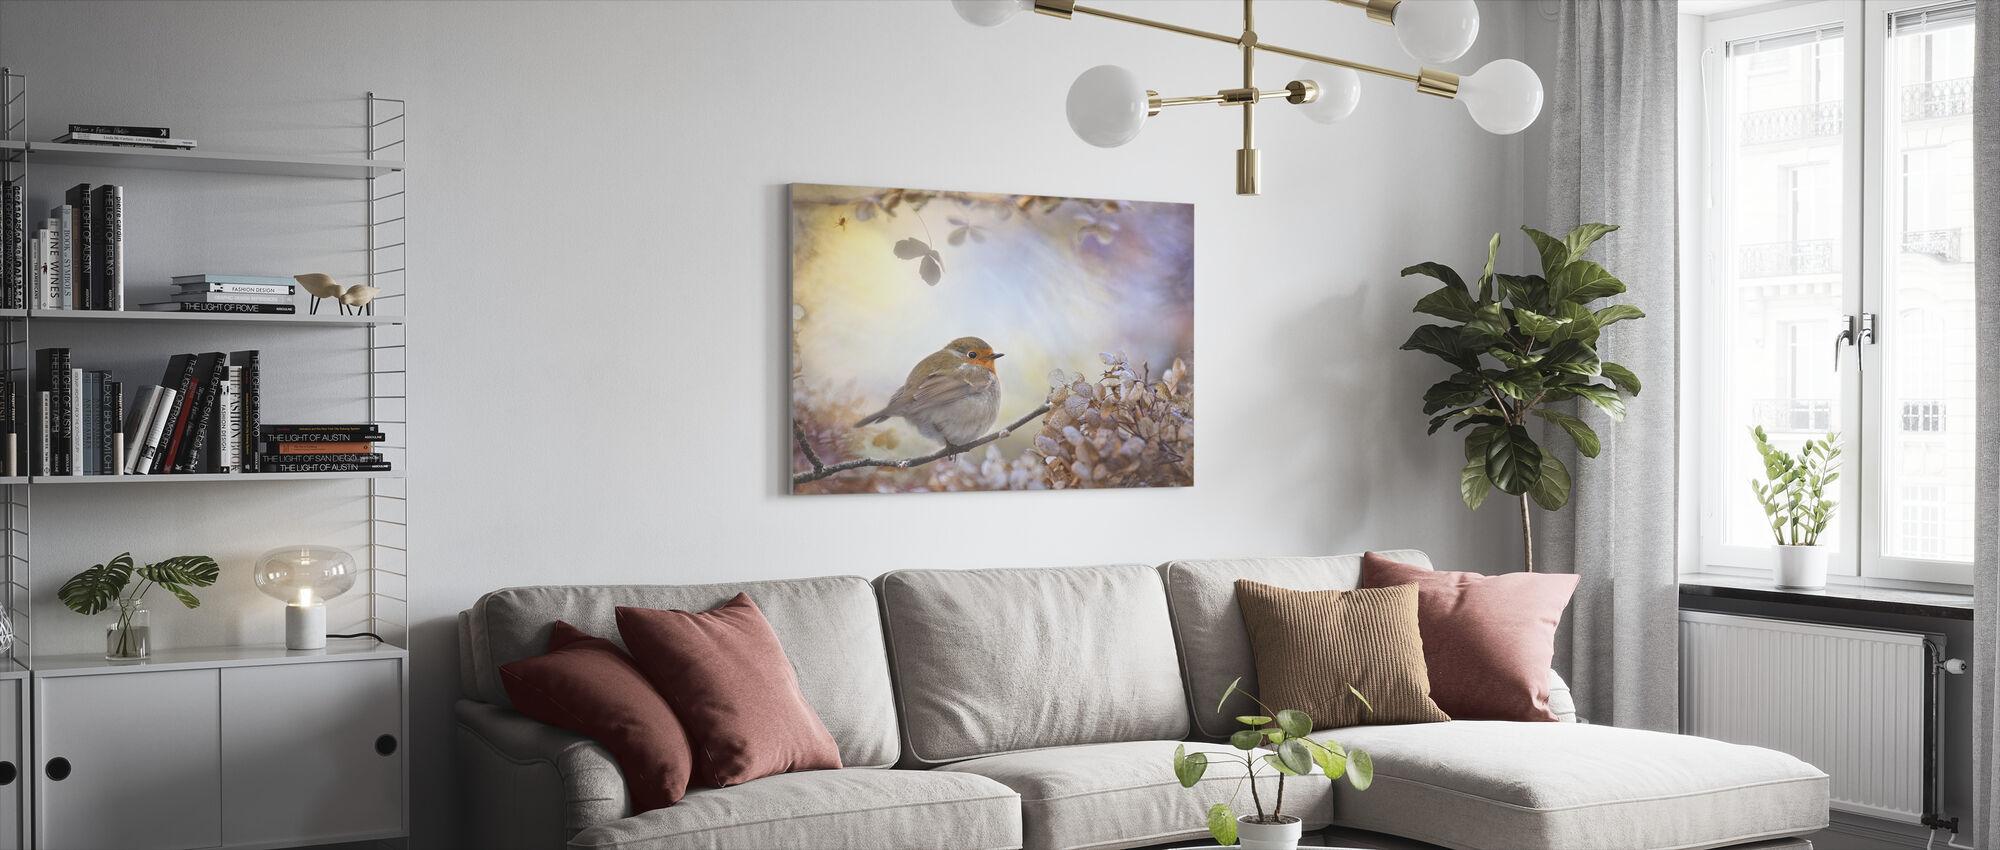 Robin unia - Canvastaulu - Olohuone